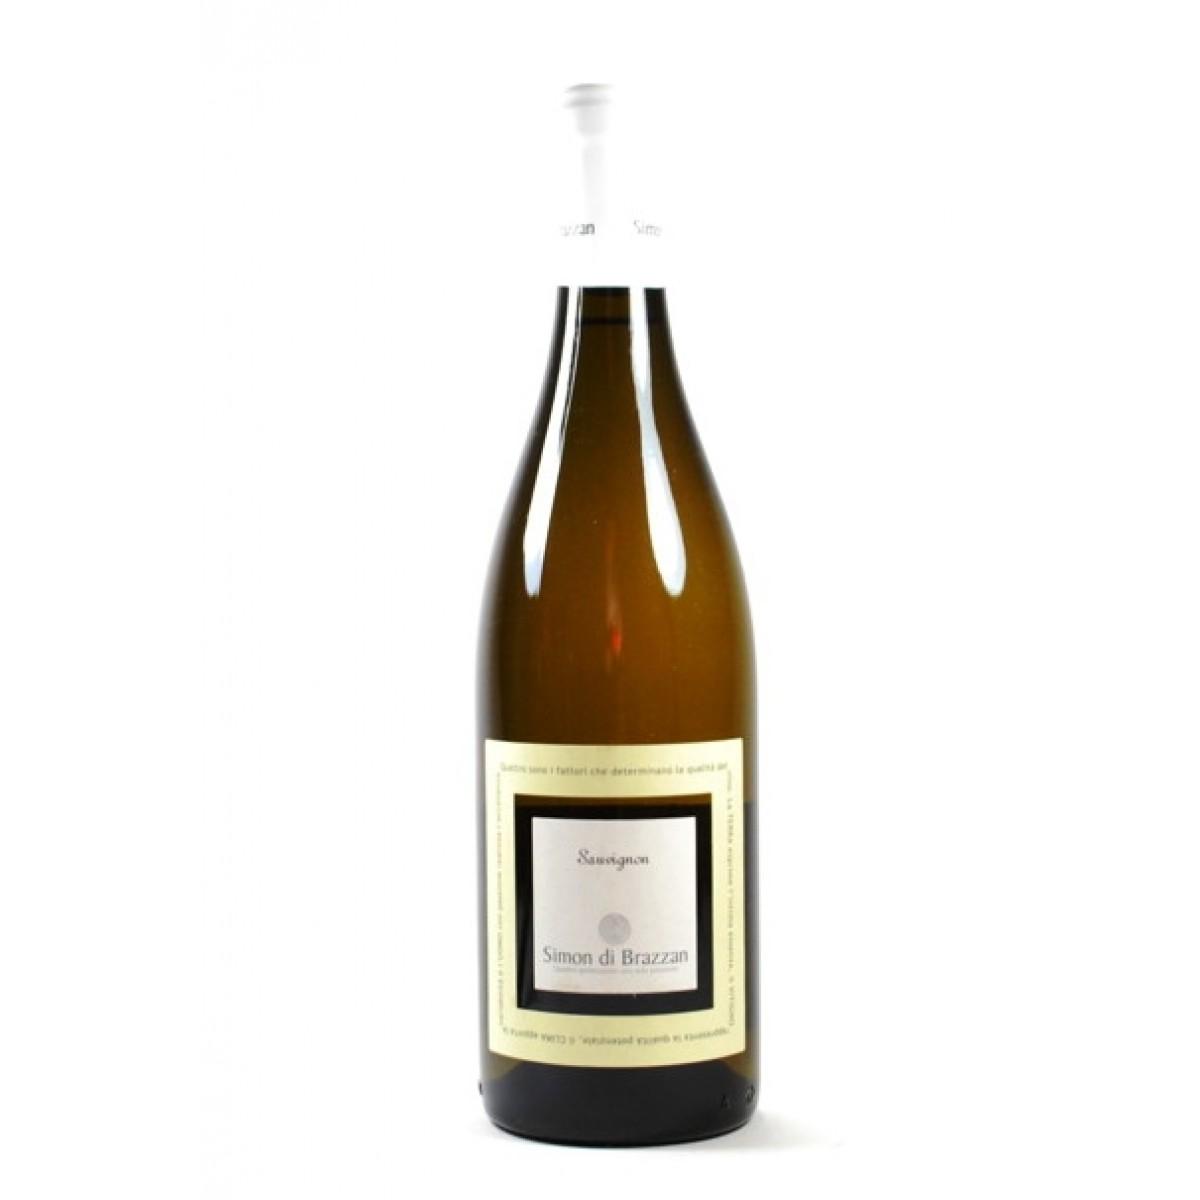 Vino bianco Sauvignon Friuli Venezia Giulia